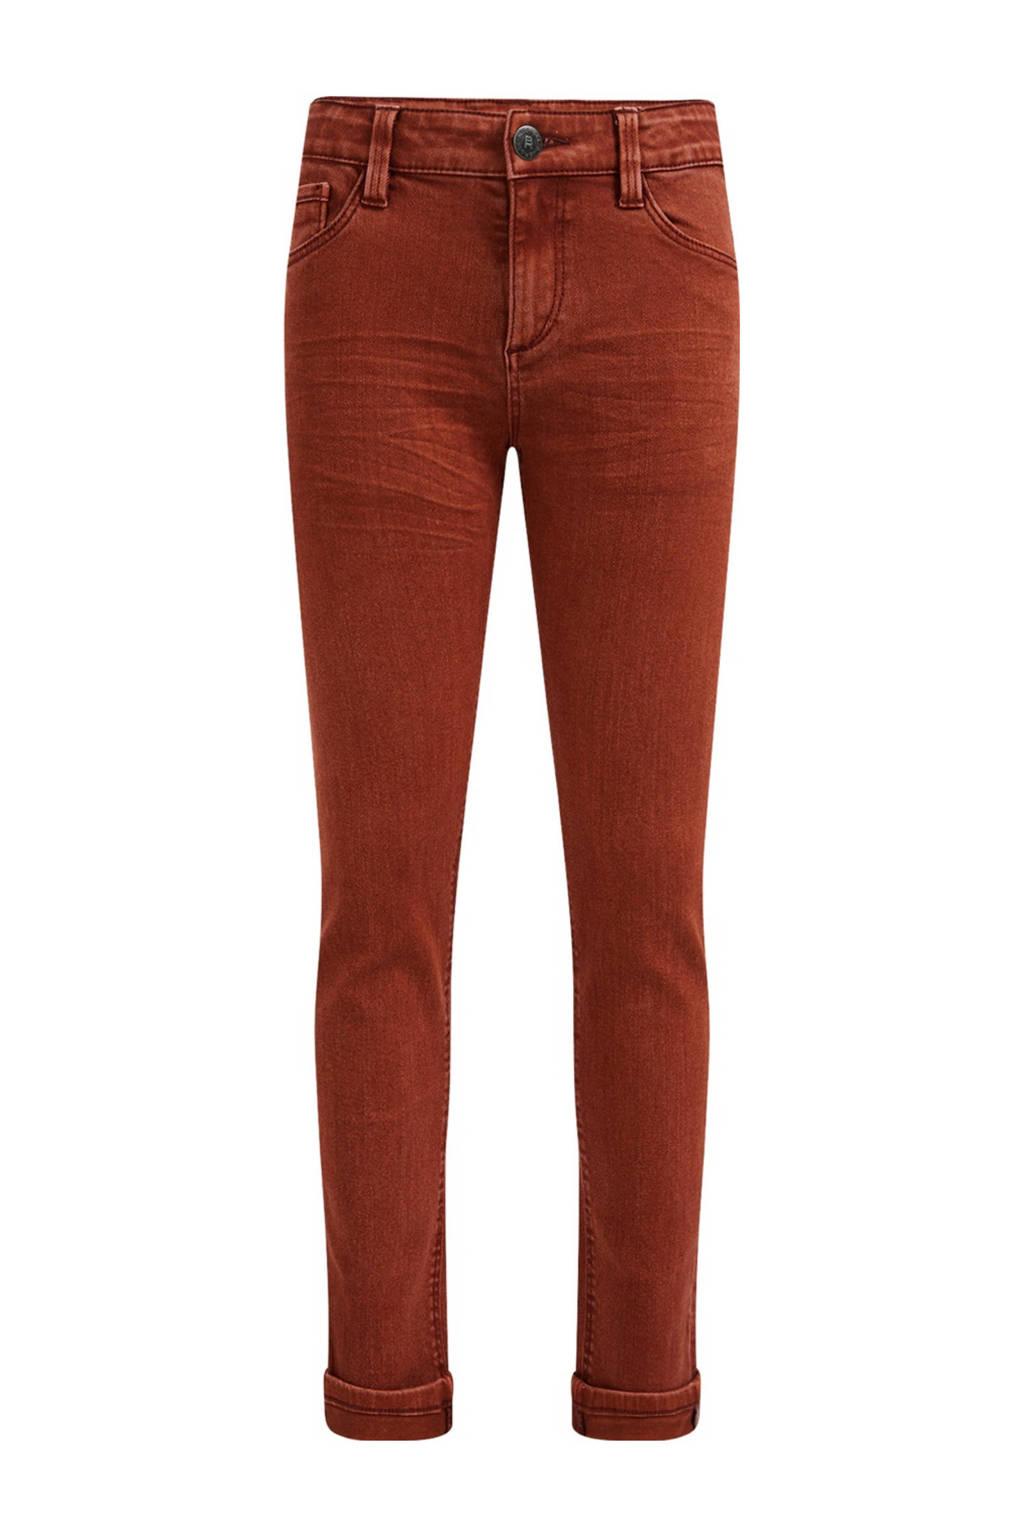 WE Fashion Blue Ridge slim fit broek bruin, Bruin